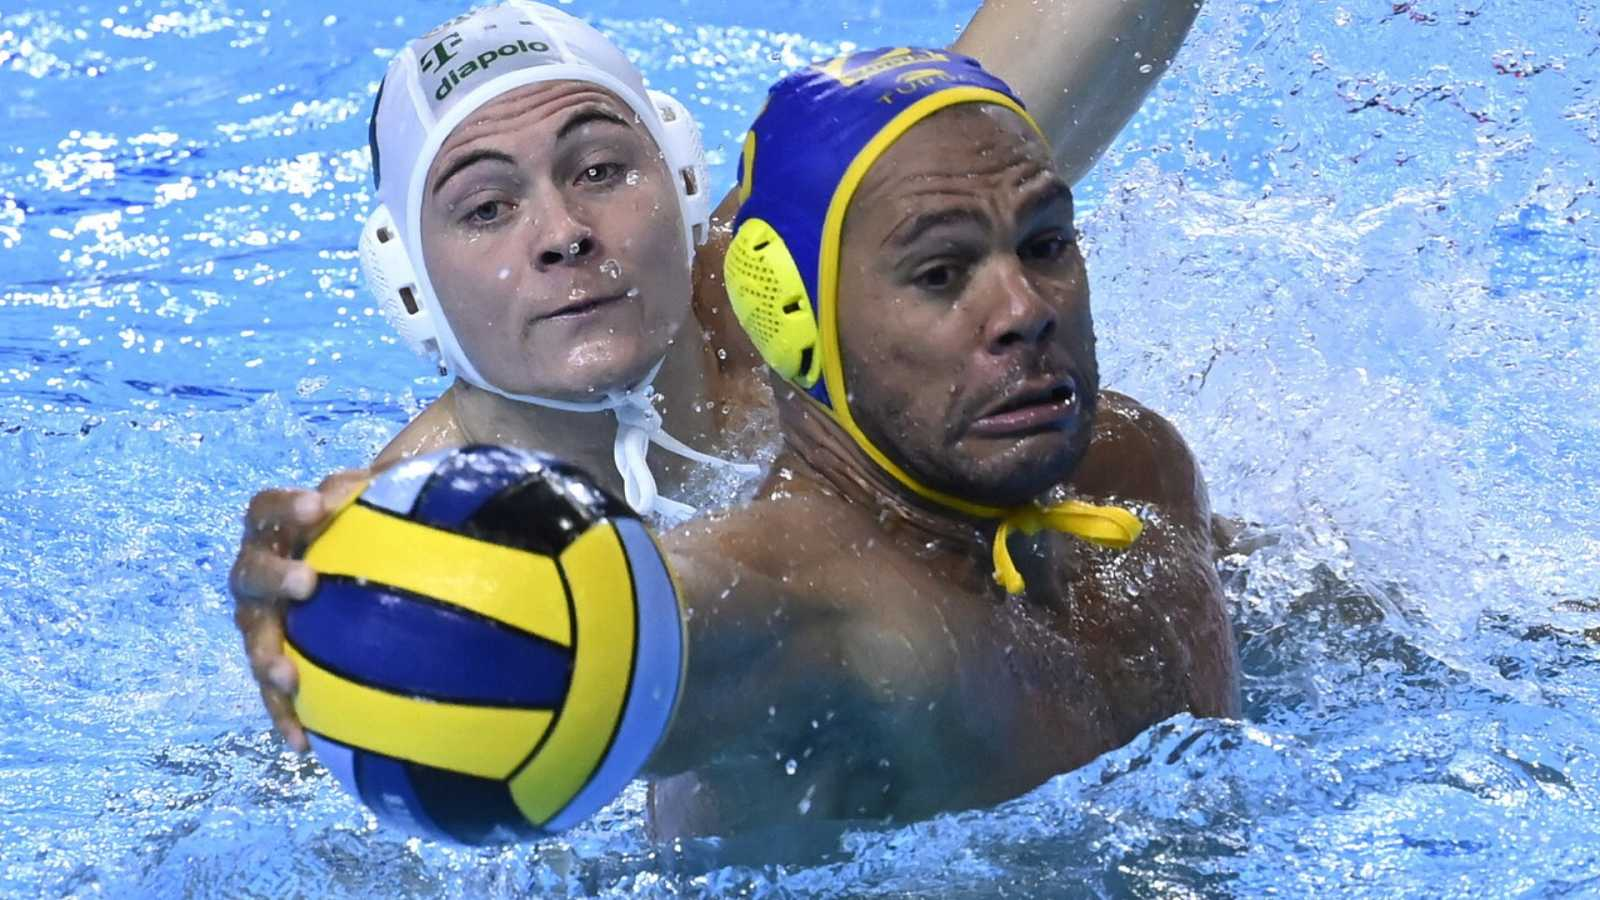 Waterpolo - Liga Europea. 2ª ronda: Jadran Herceg Novi - Zodiac CN AT Barceloneta - ver ahora